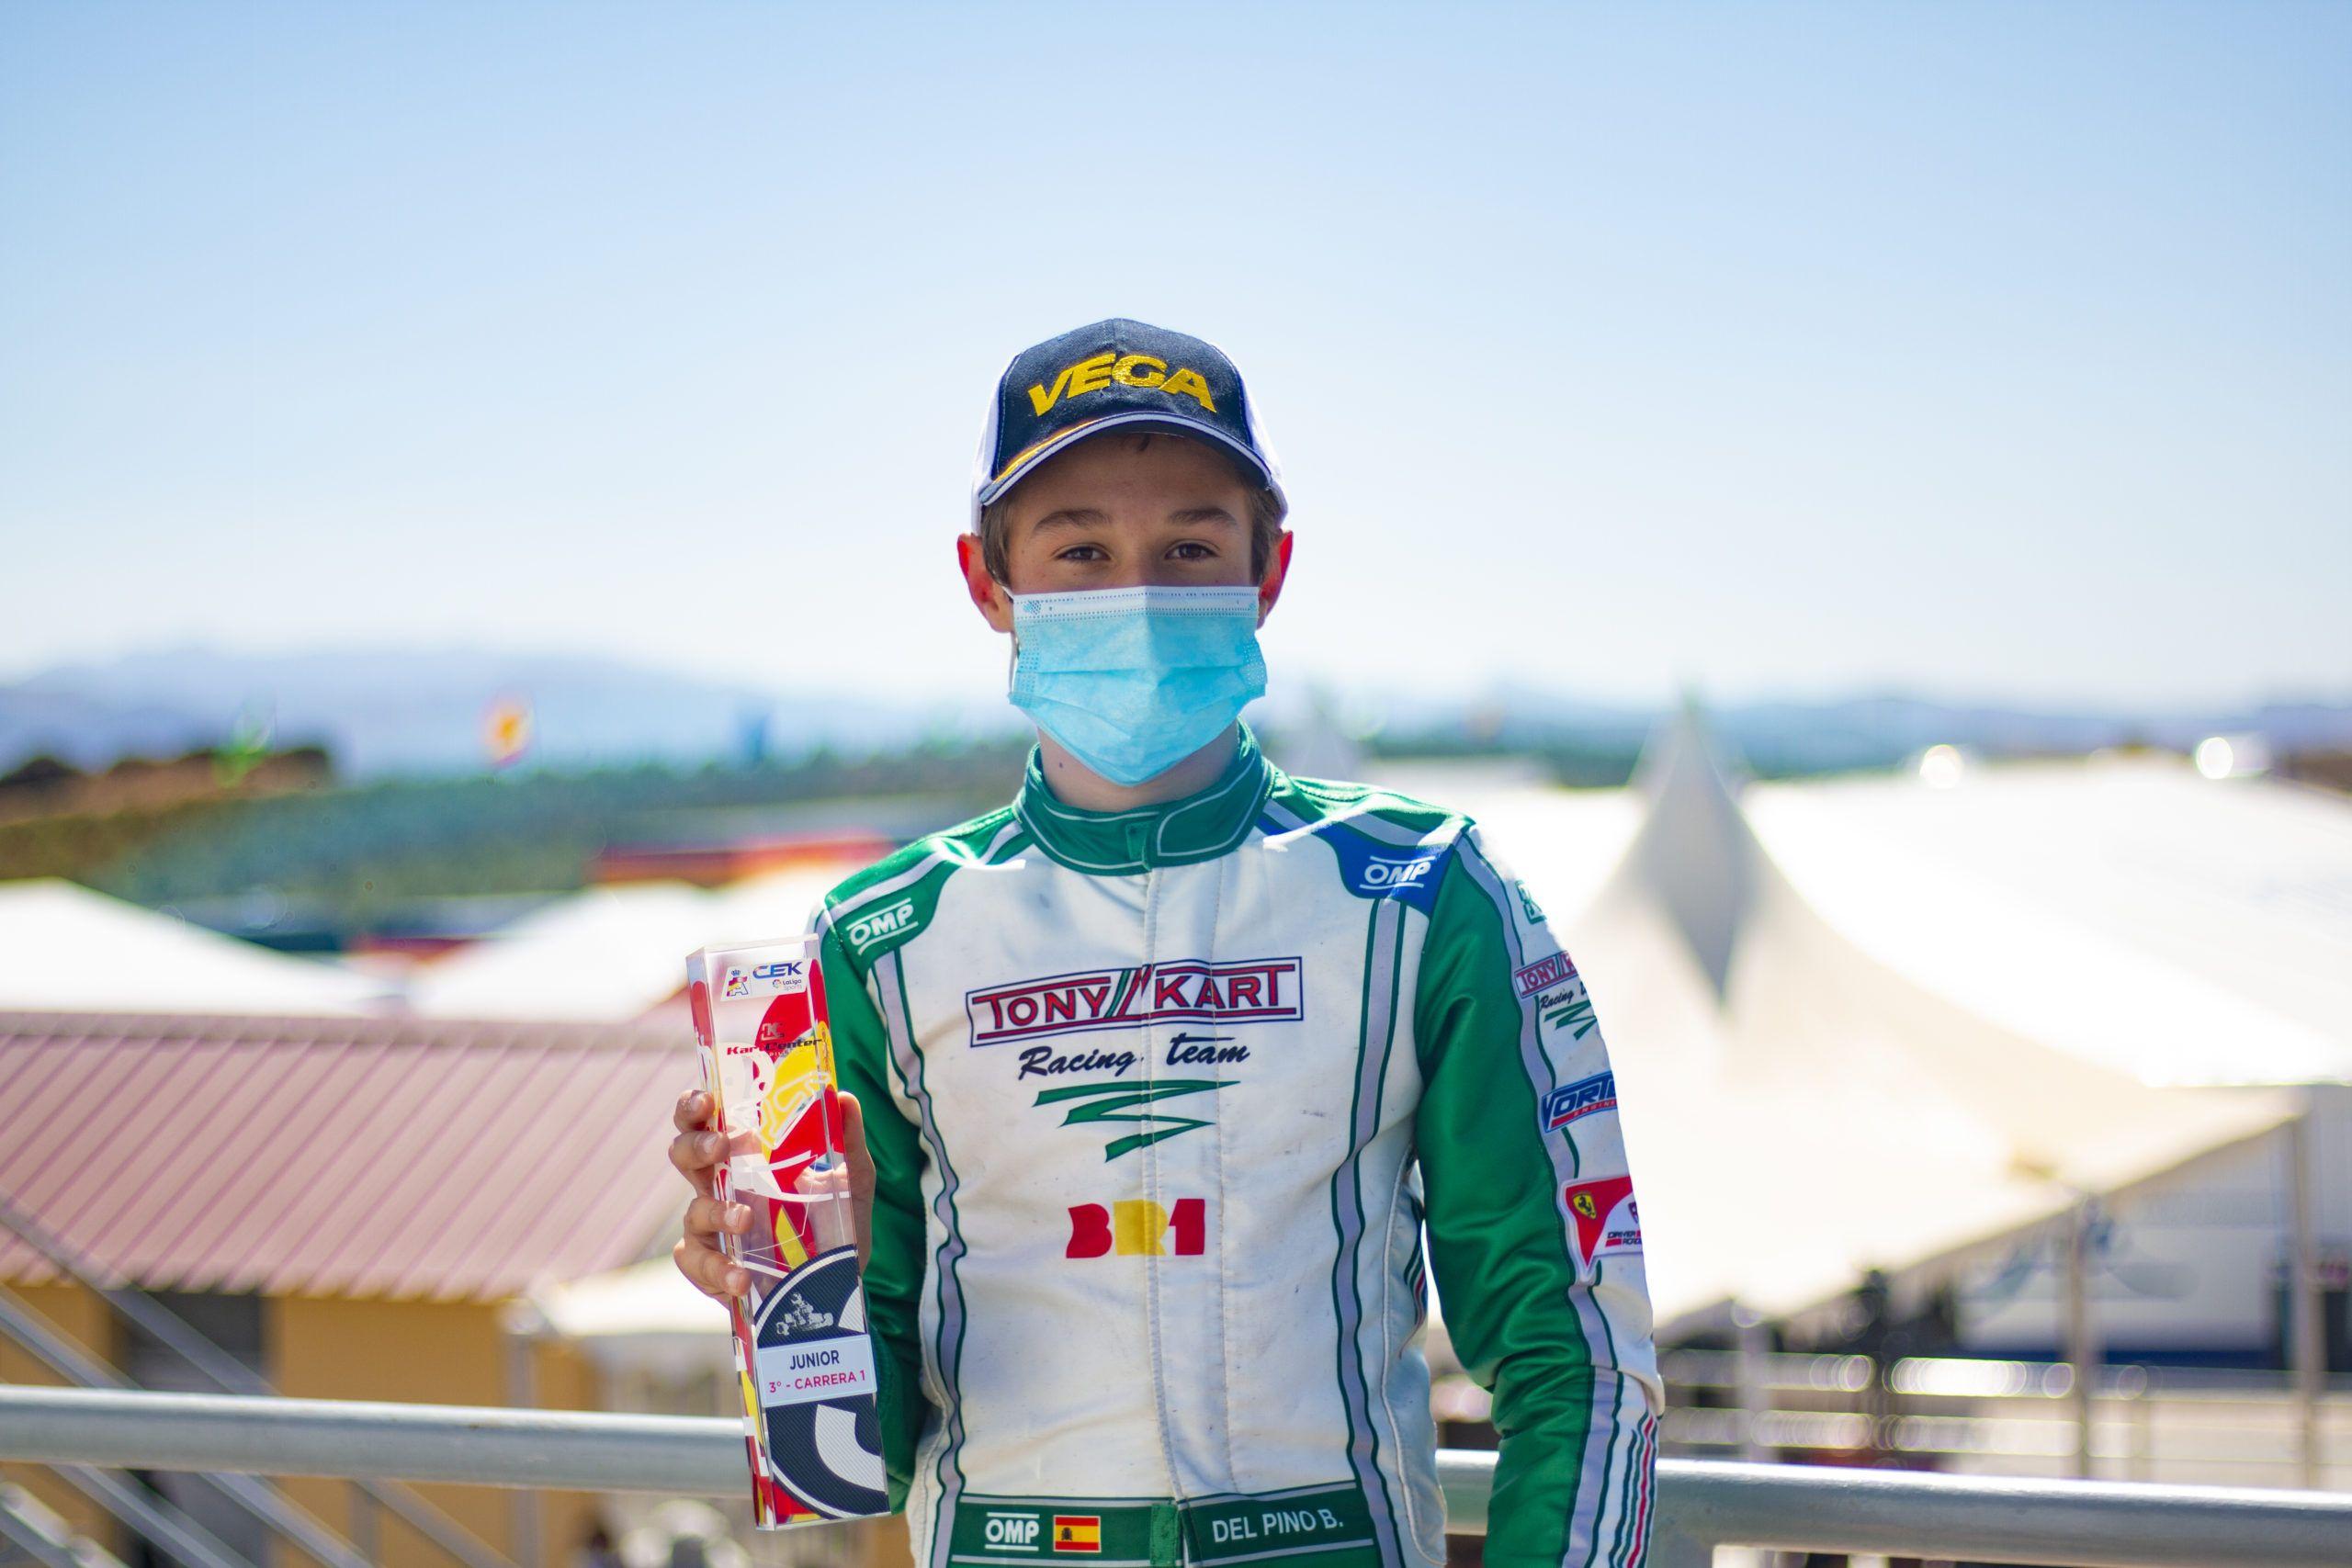 Bruno del Pino, Tony kart Racing team